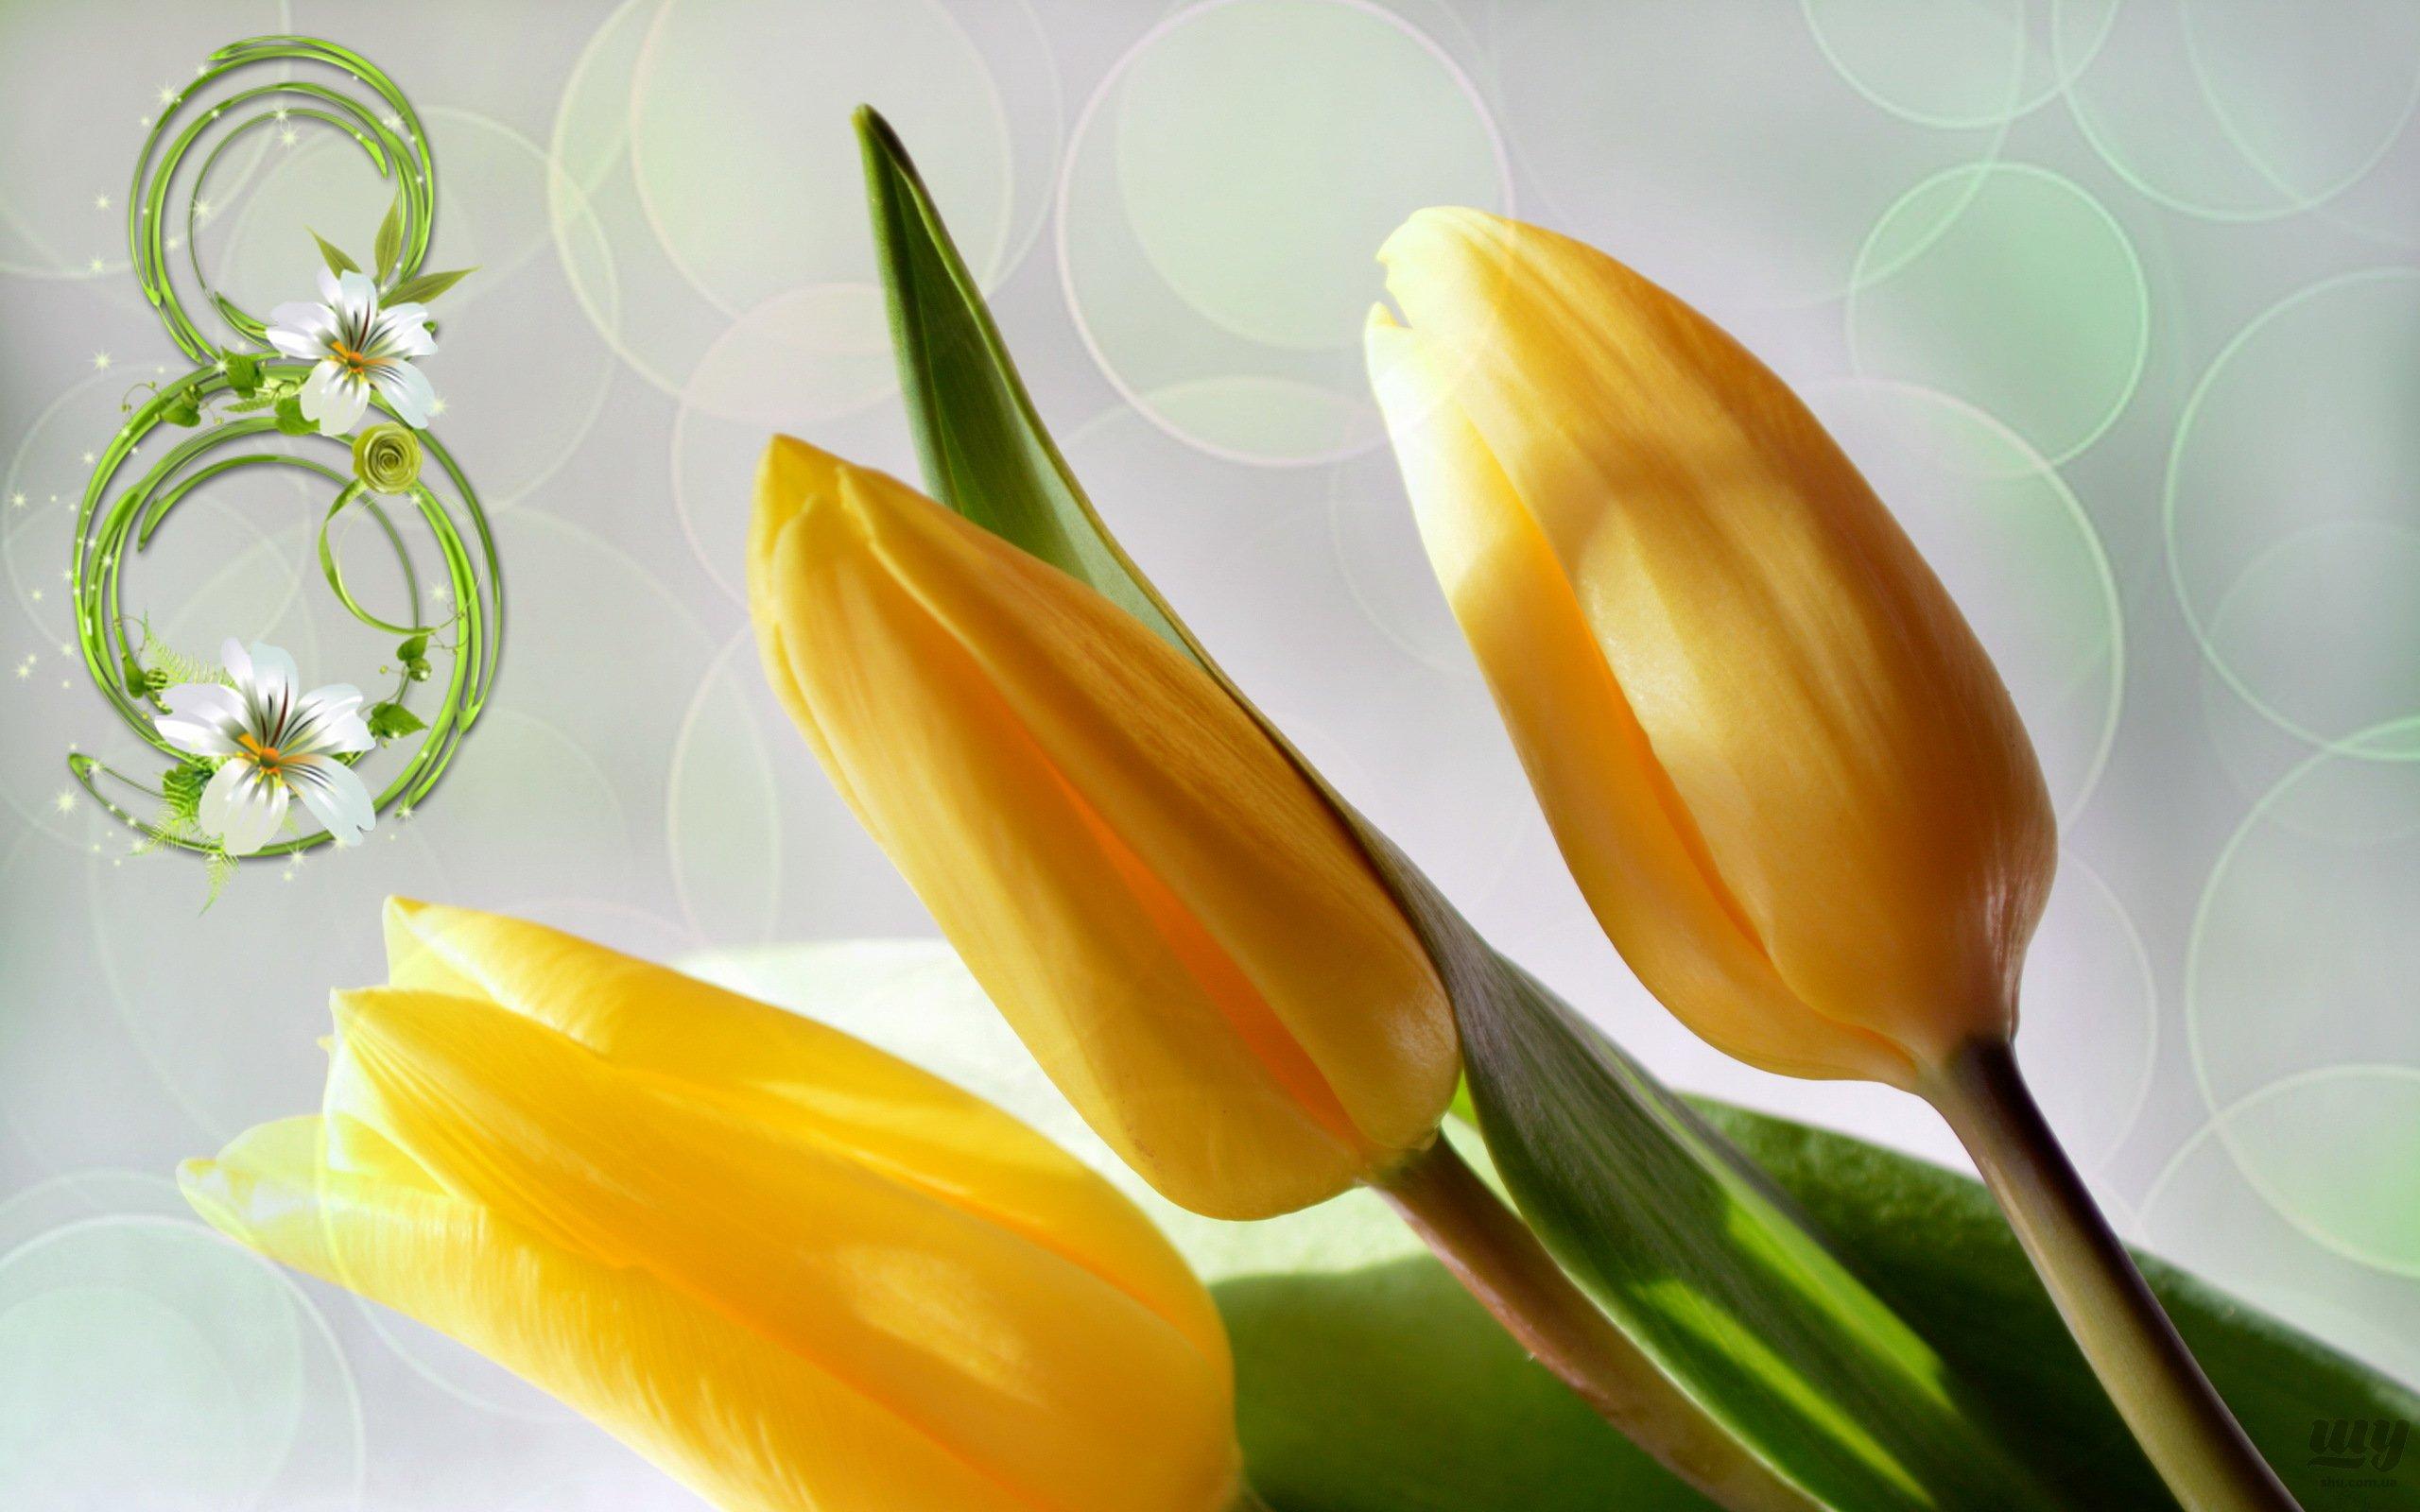 -happy-8-march-1699299-2560x1600.jpg